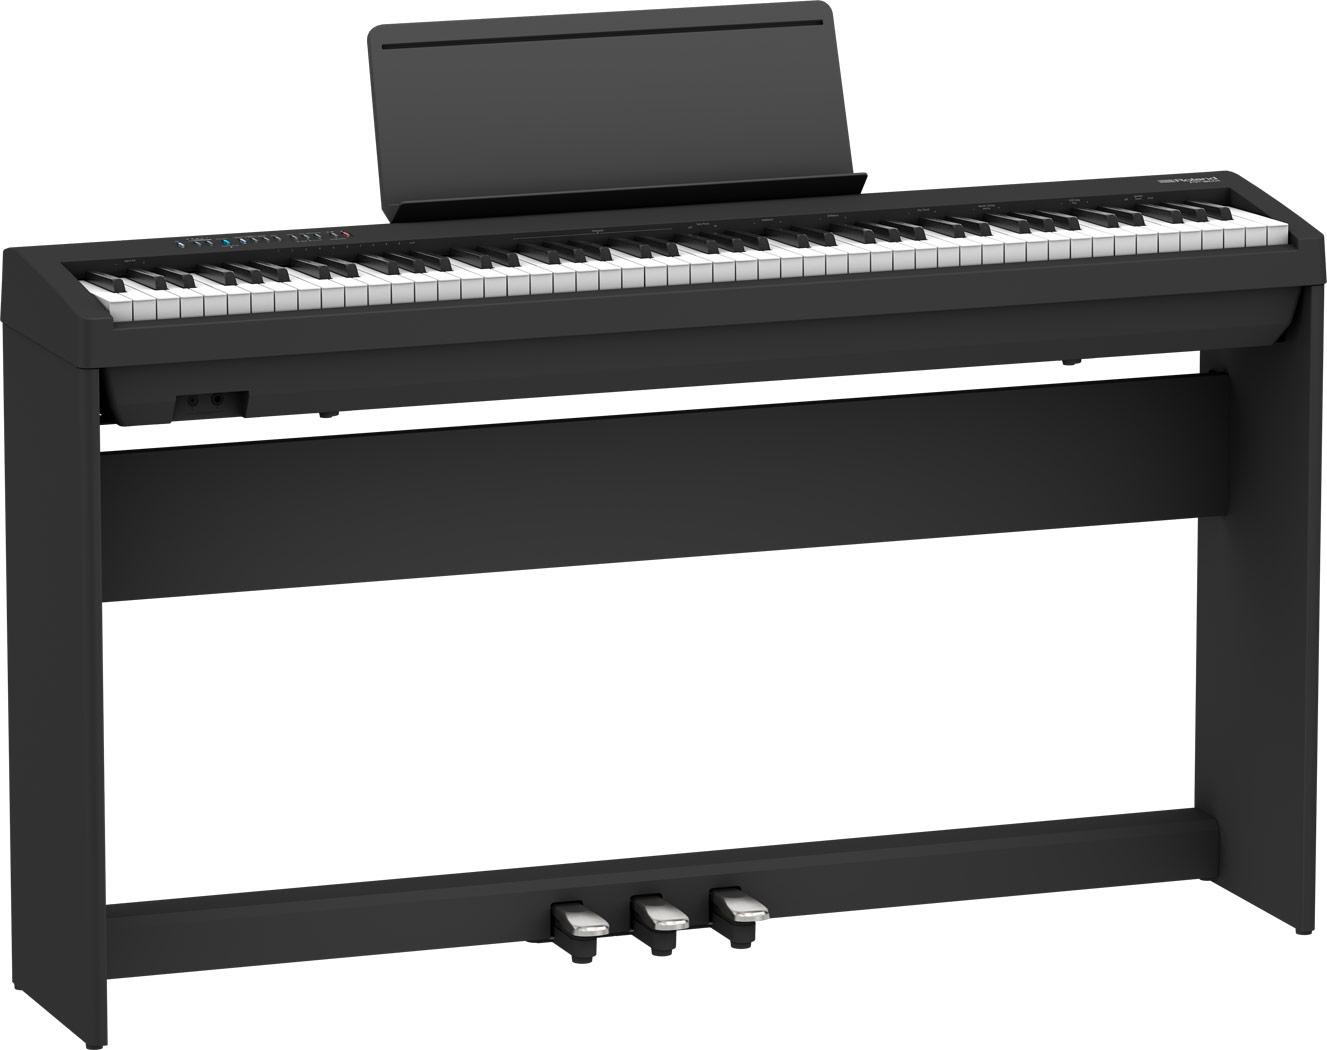 FP-30X Roland FP-30升級款 88鍵舞台型電鋼琴